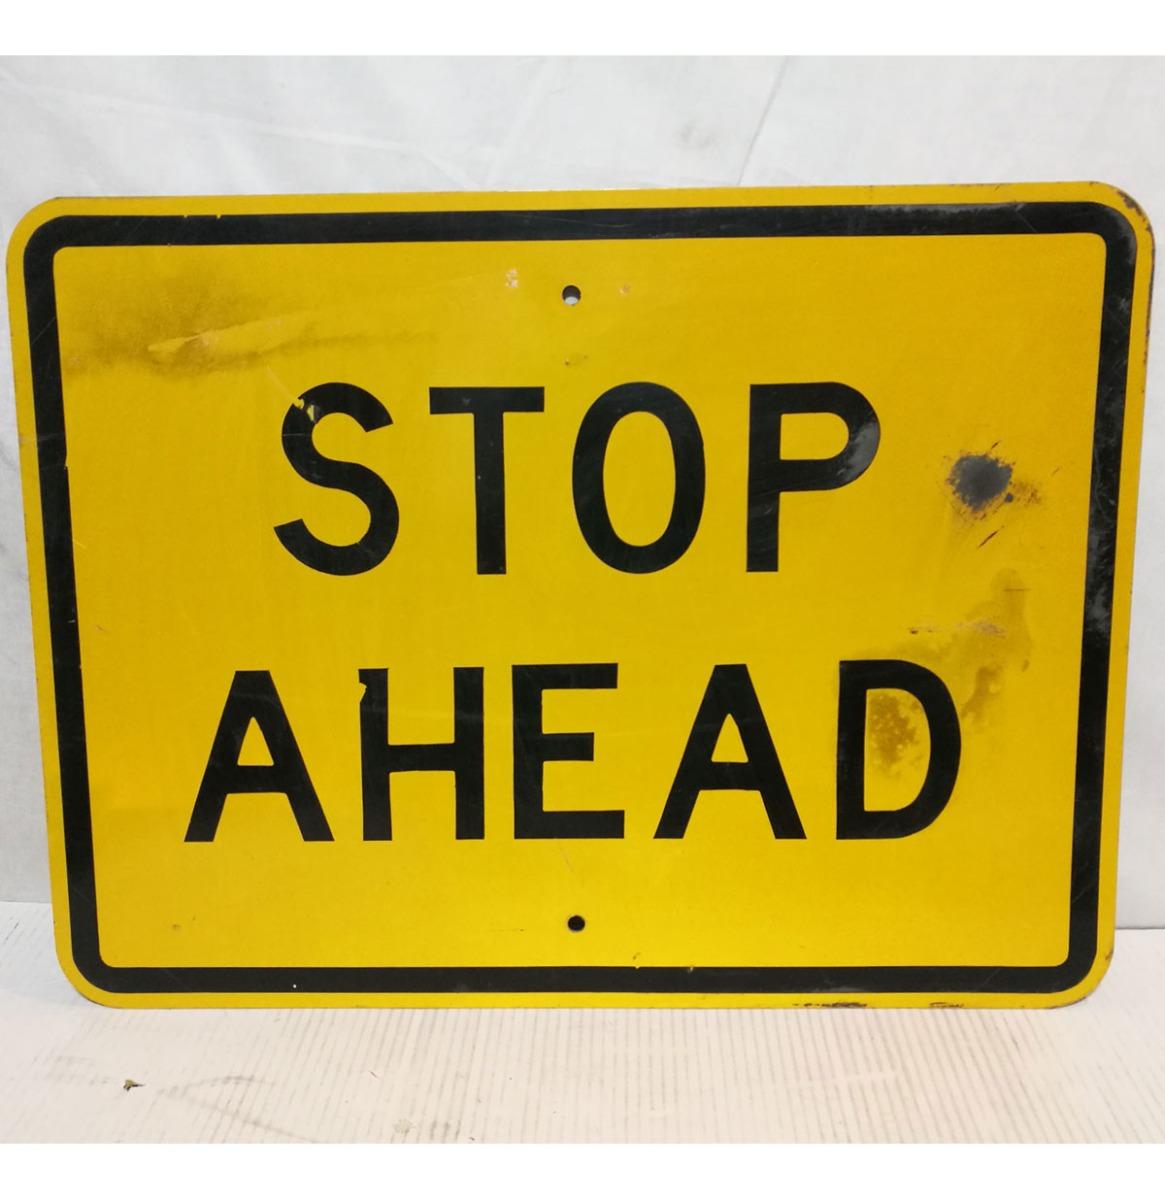 Stop Ahead Straat Bord - Origineel